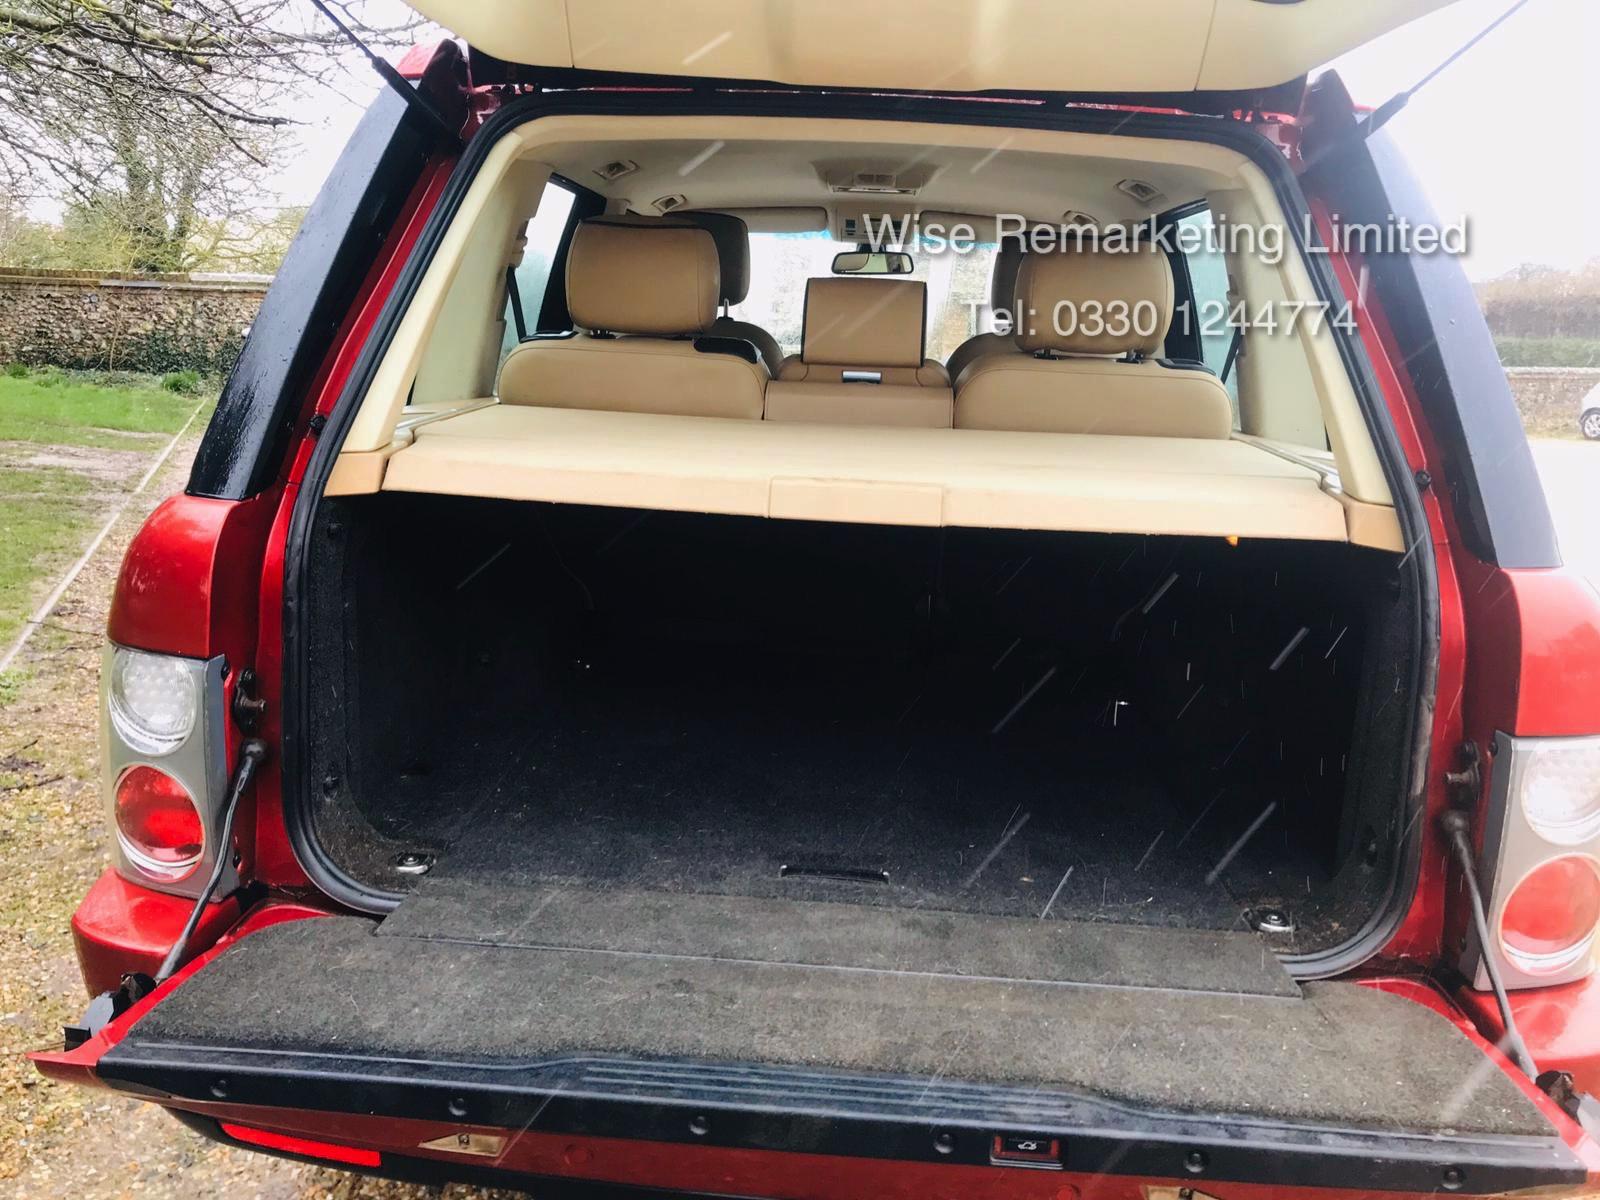 Range Rover Vogue 3.6 TDV8 HSE Auto - 2010 Model - Cream Leather - Service History - - Image 8 of 28